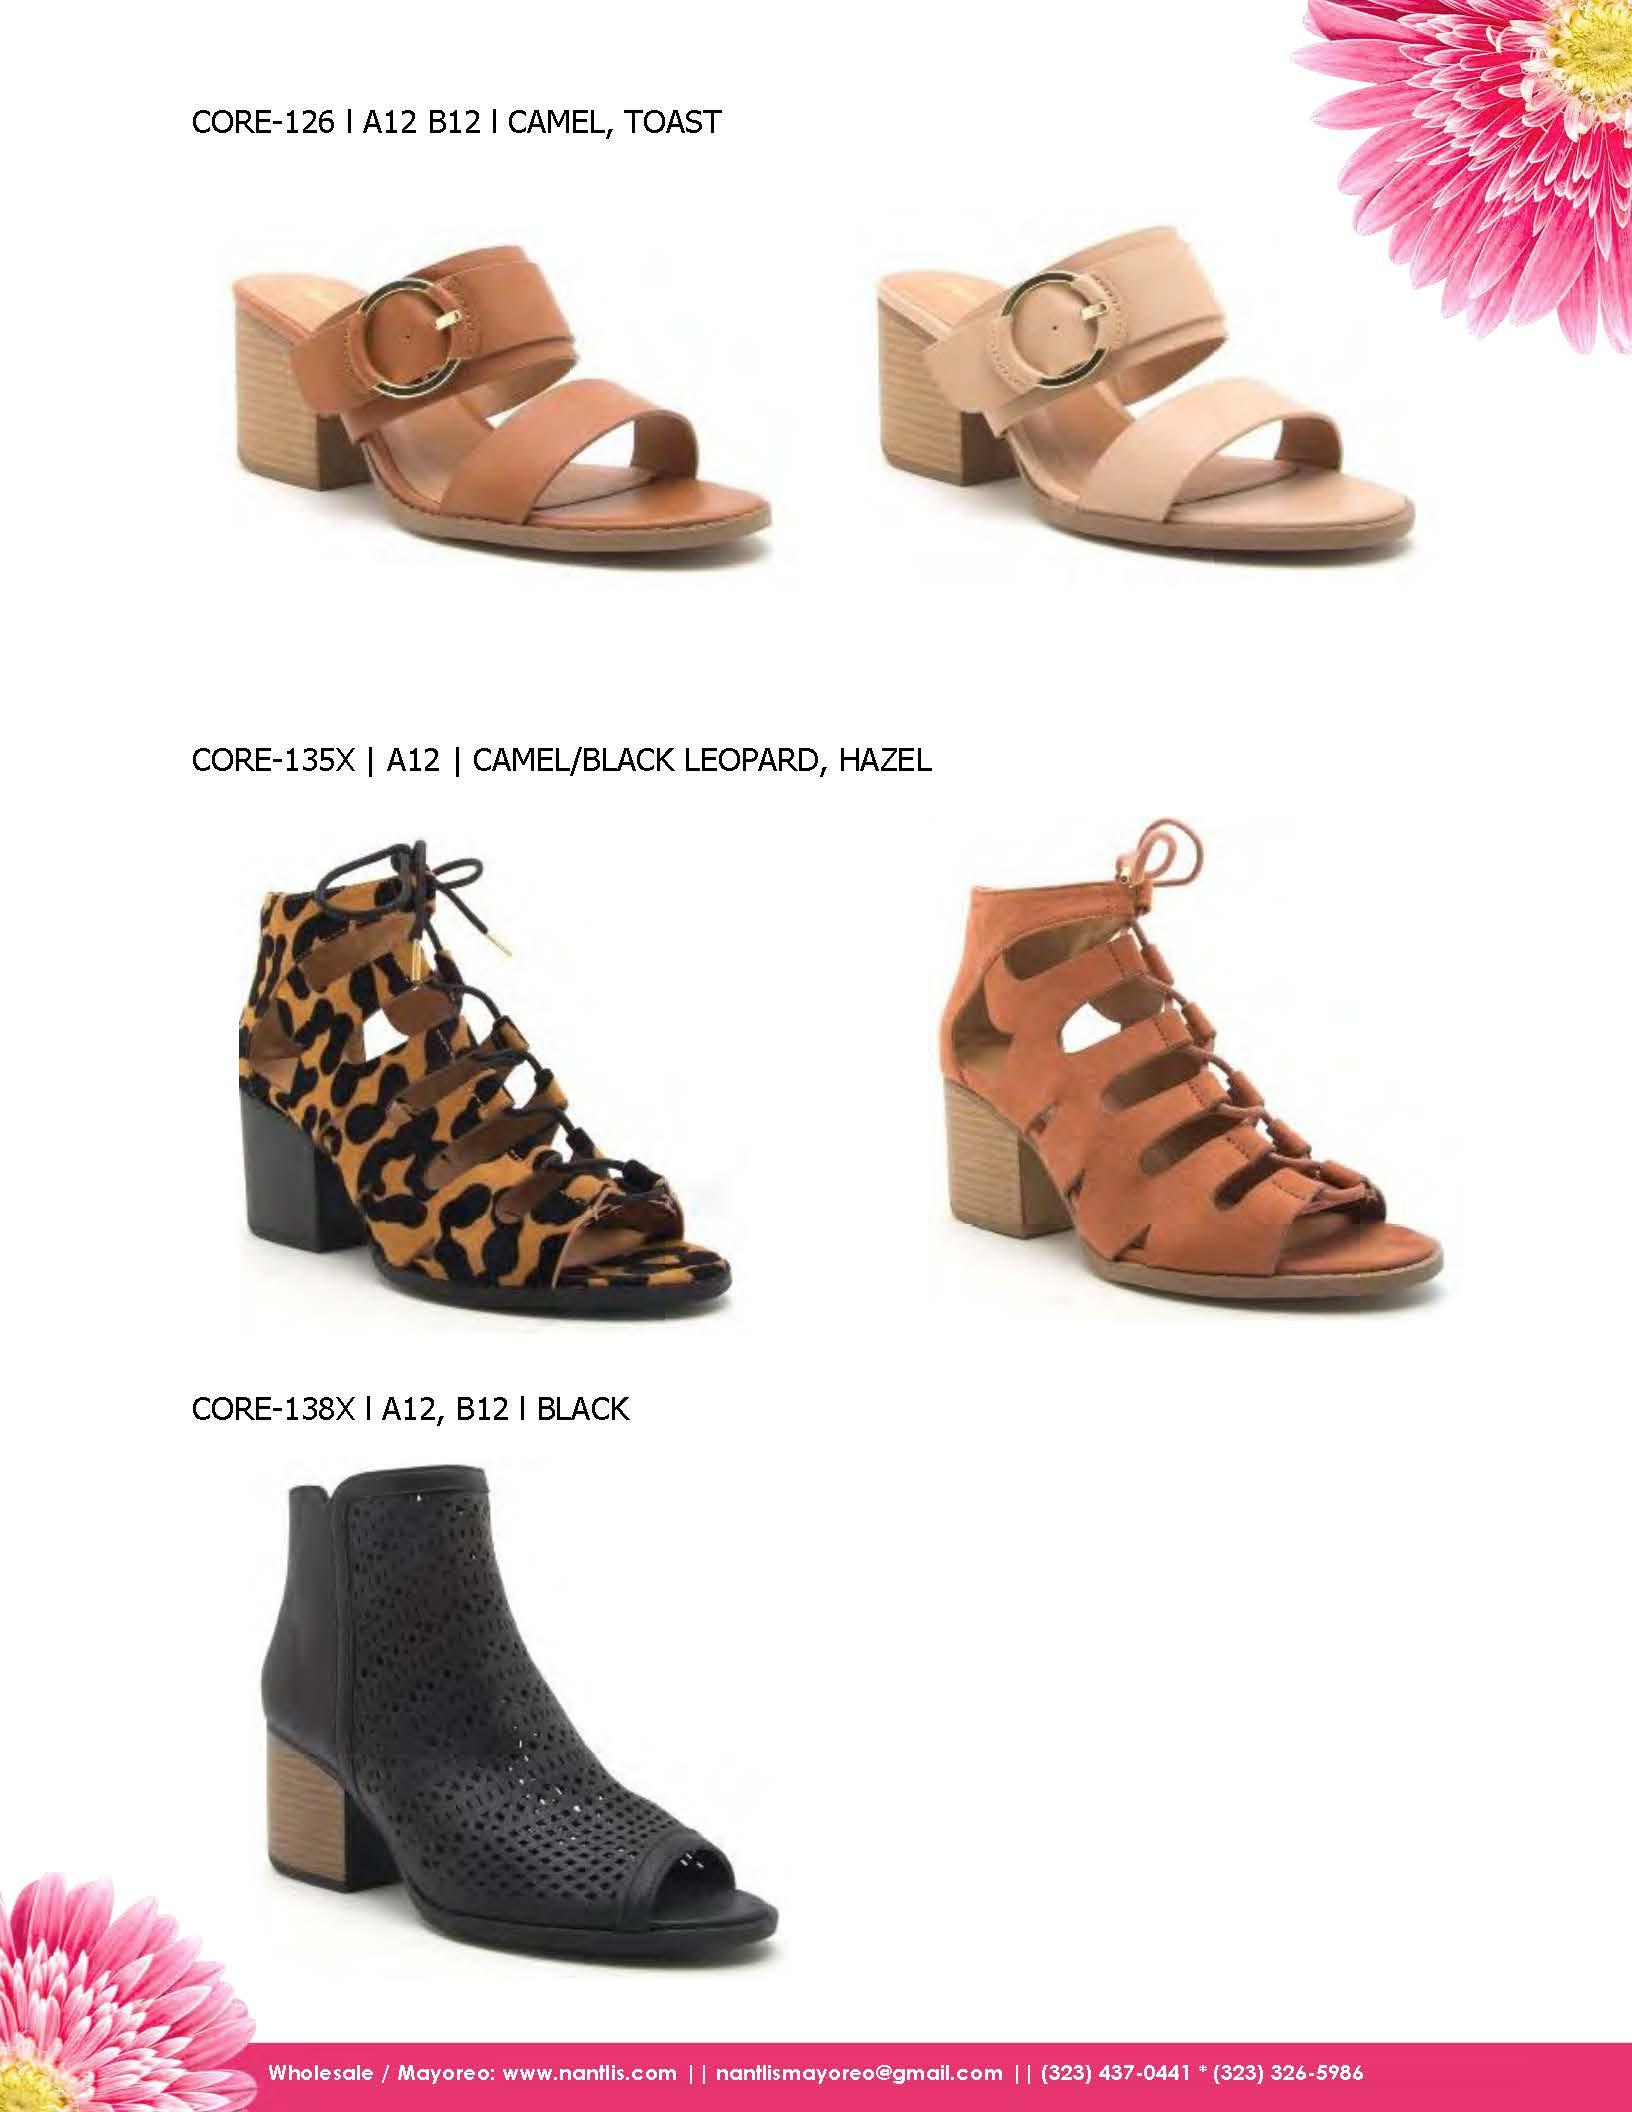 Nantlis Vol QU43 Zapatos para mujer mayoreo Wholesale shoes for women_Page_16